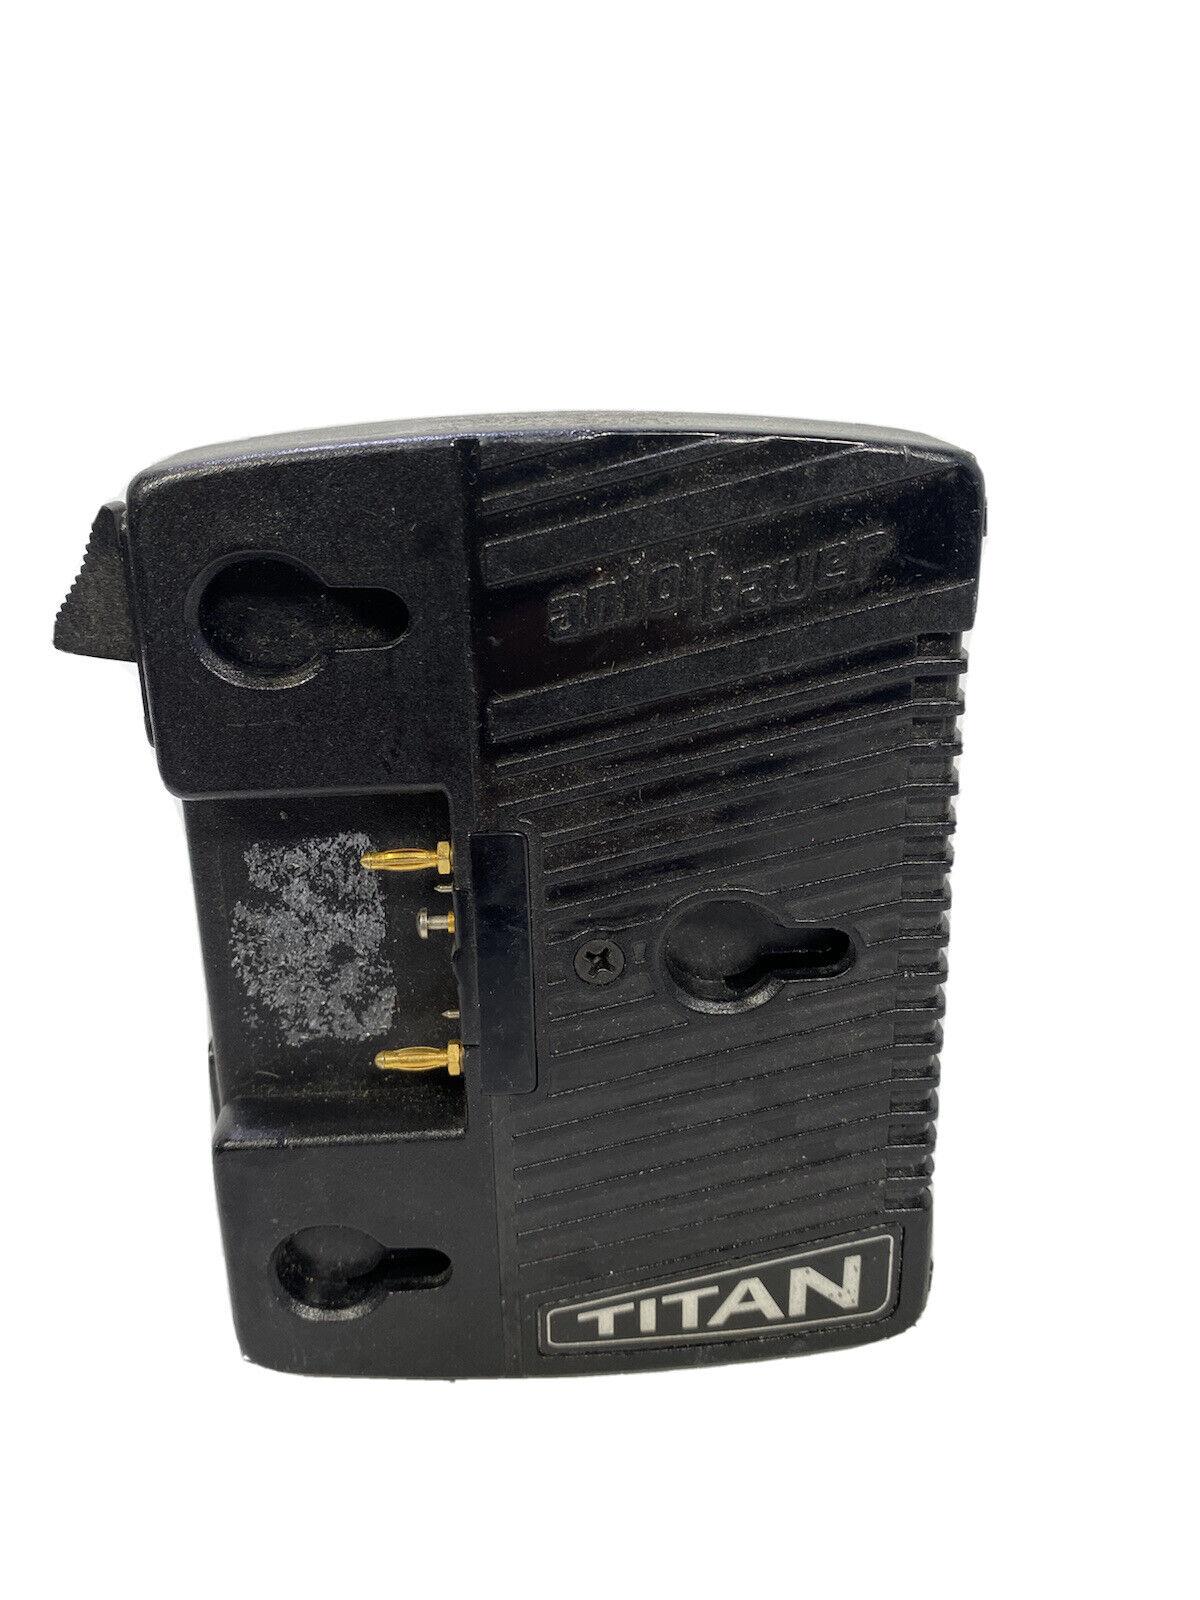 Anton Bauer Titan Gold Mount Charger/ Power Supply